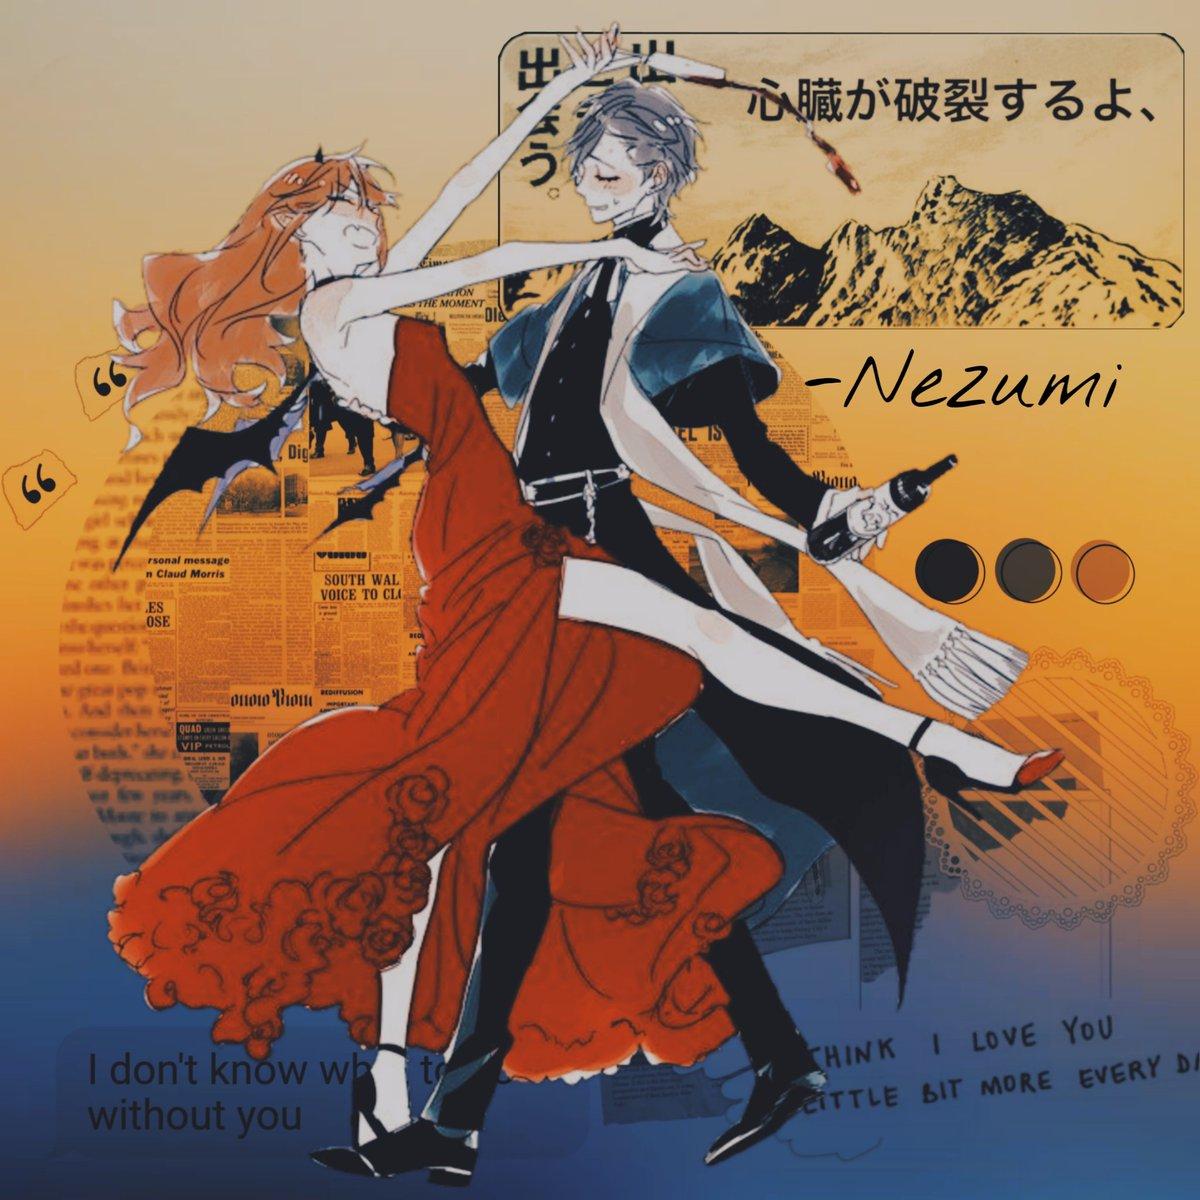 #anime #edit #AnimeEdit #couple #AnimeCouple #AnimeLove #Love #anime_love #anime_edit #anime_couple #picsart #art #manhwa #mangapic.twitter.com/wnCcOI9DrB